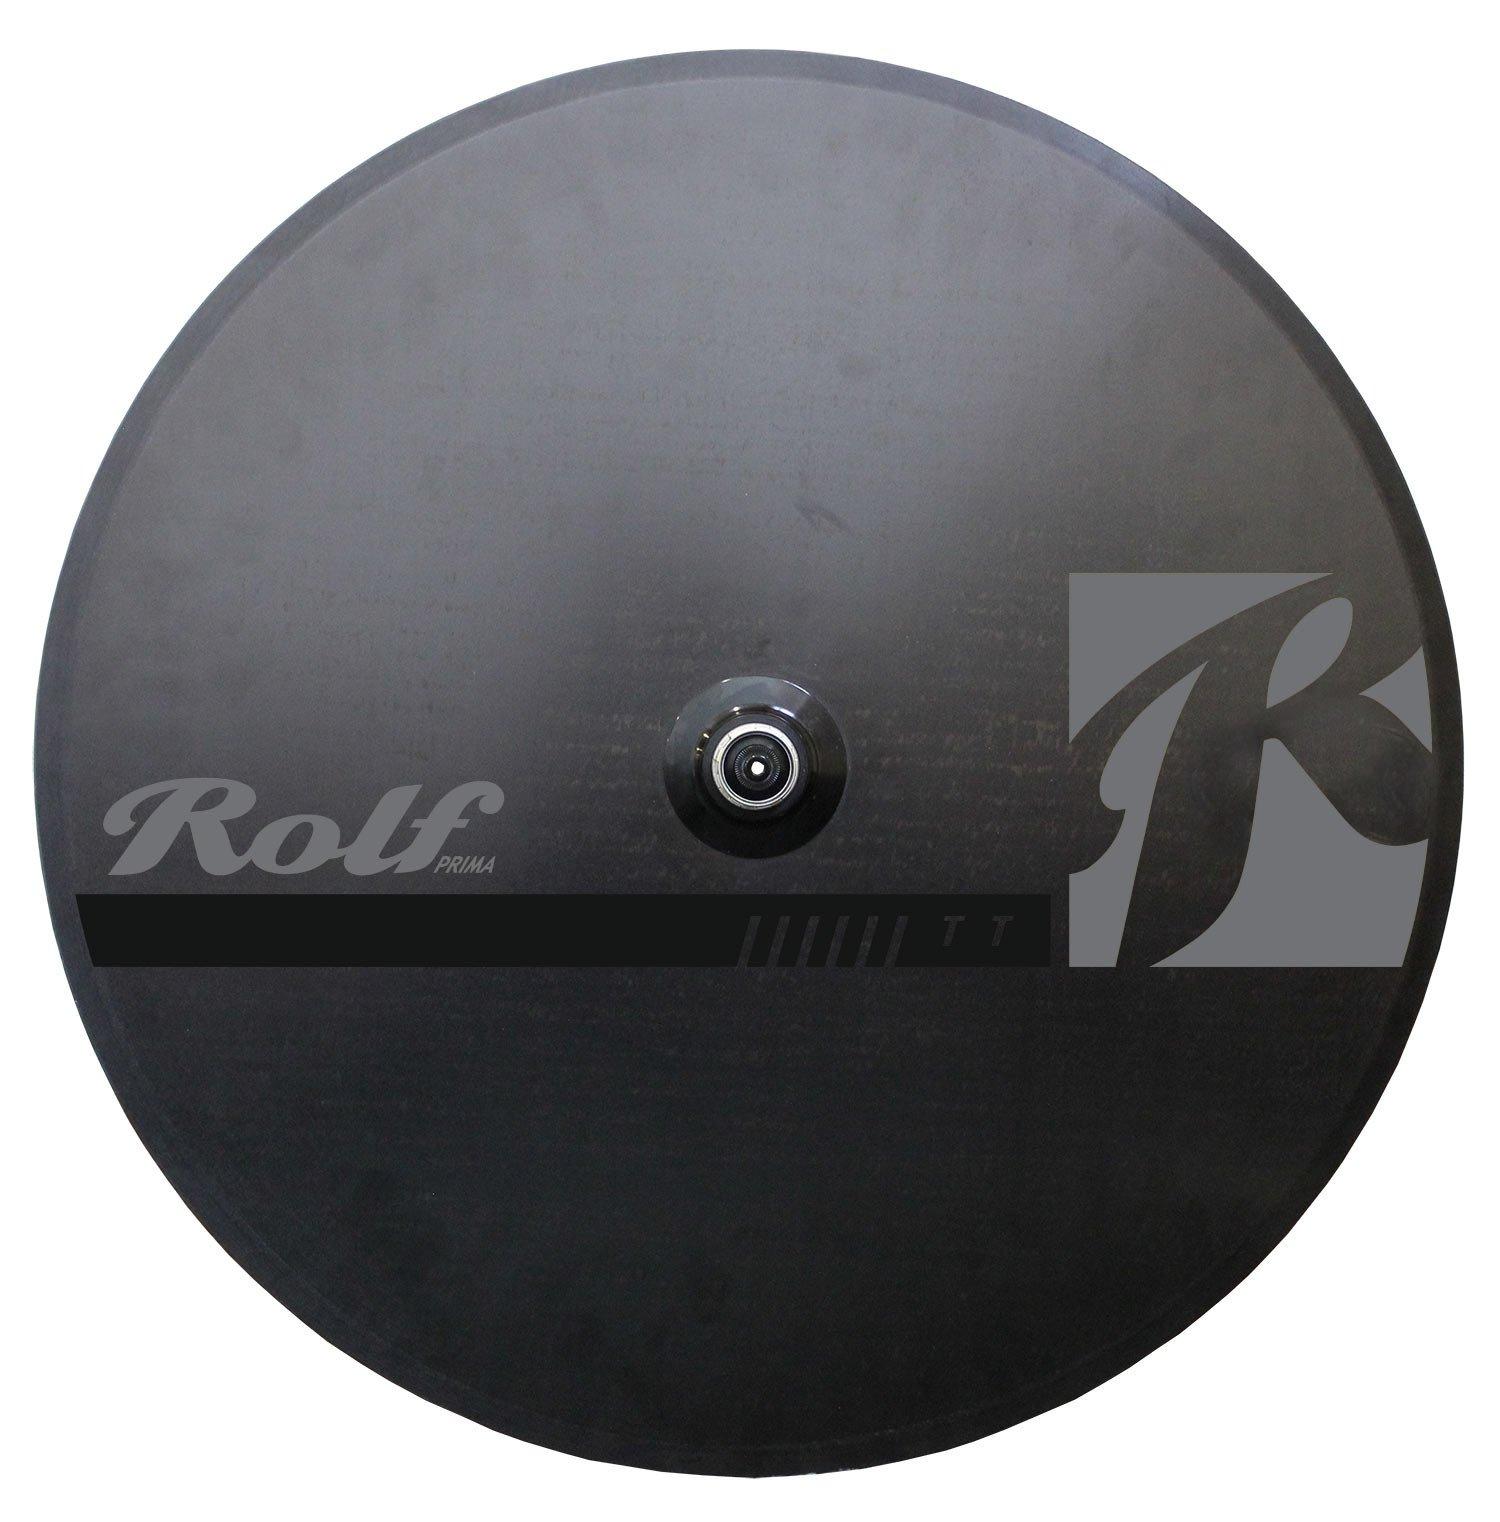 Rolf PRIMA - Carbon DISC - plášť Rolf PRIMA - Carbon DISC - plášť